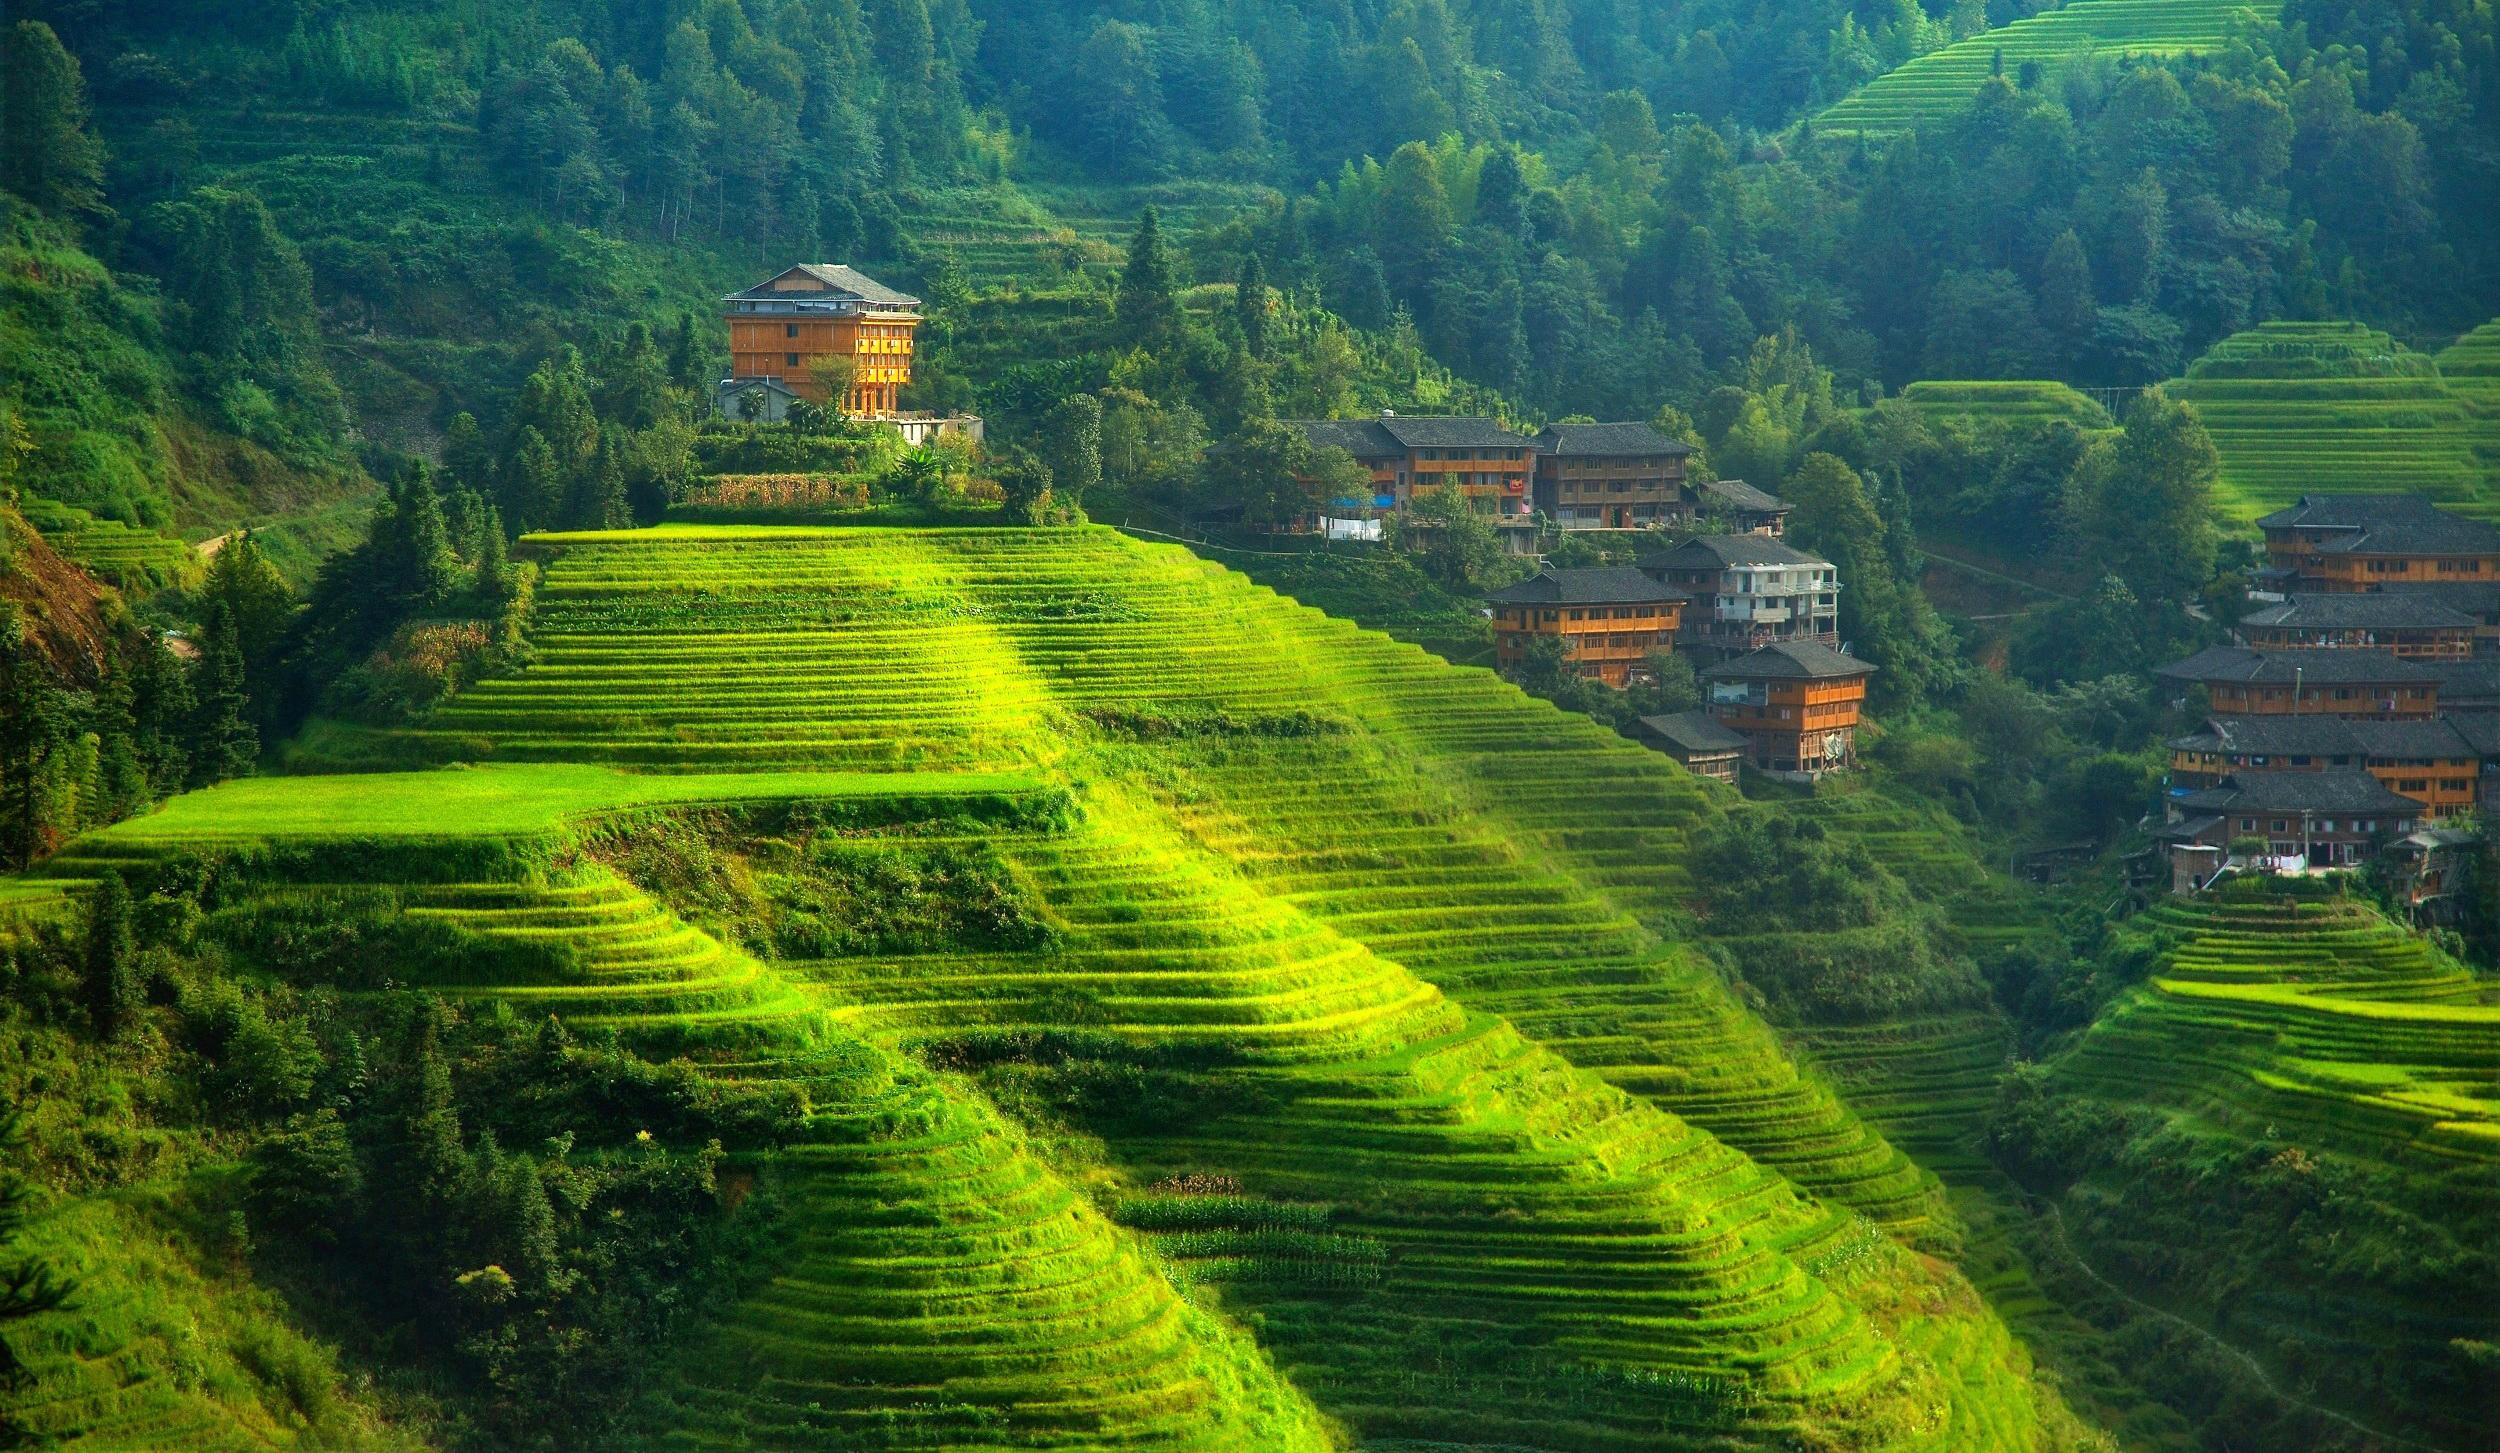 xinhua china anhui laian pond cypress scenery scenery - HD2500×1453